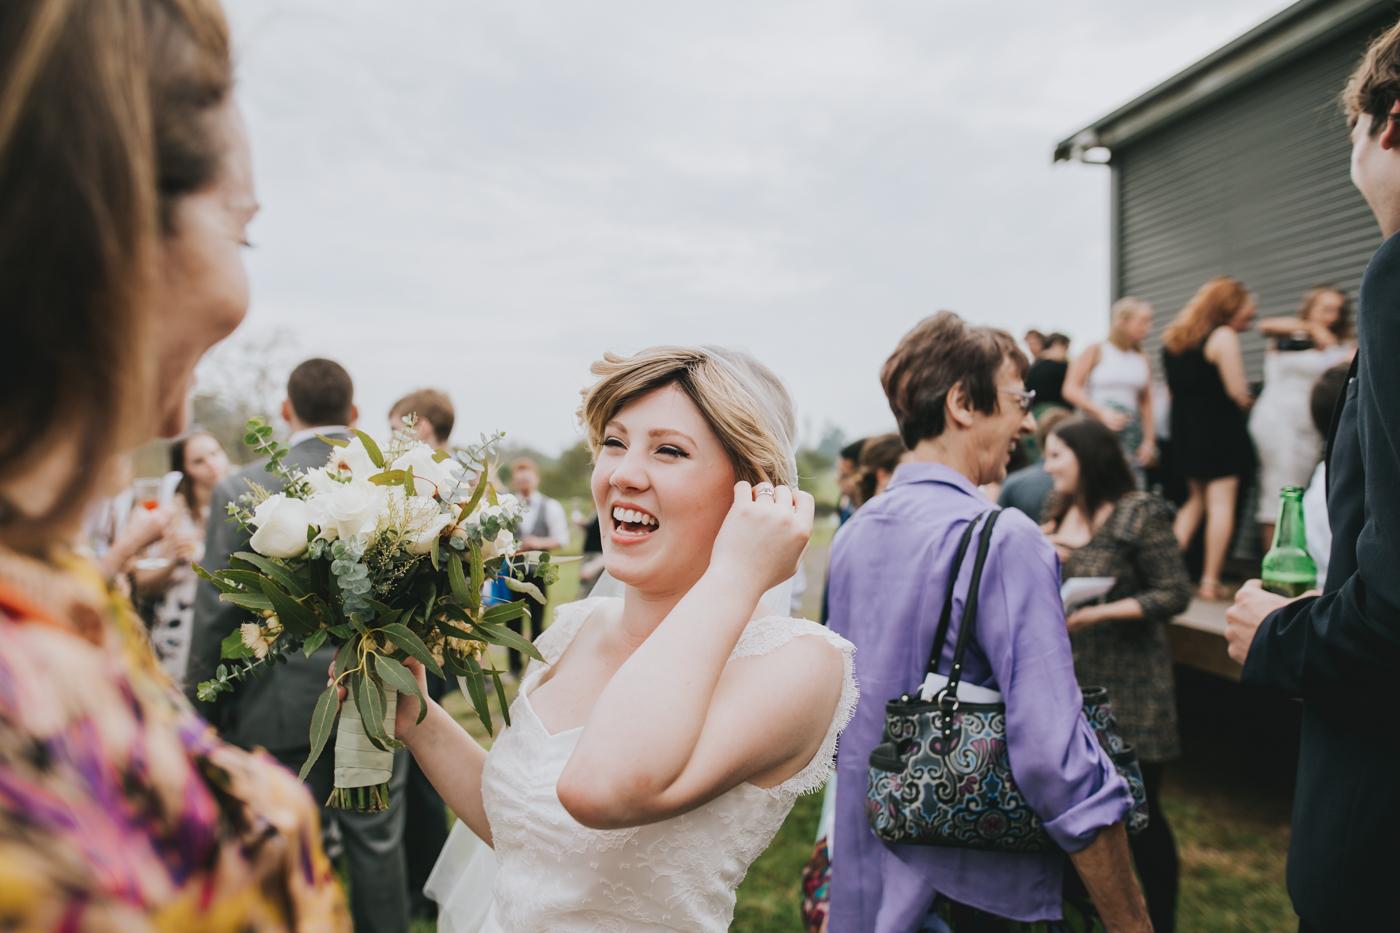 Rachel & Jacob - Willow Farm Berry - South Coast Wedding - Samantha Heather Photography-94.jpg